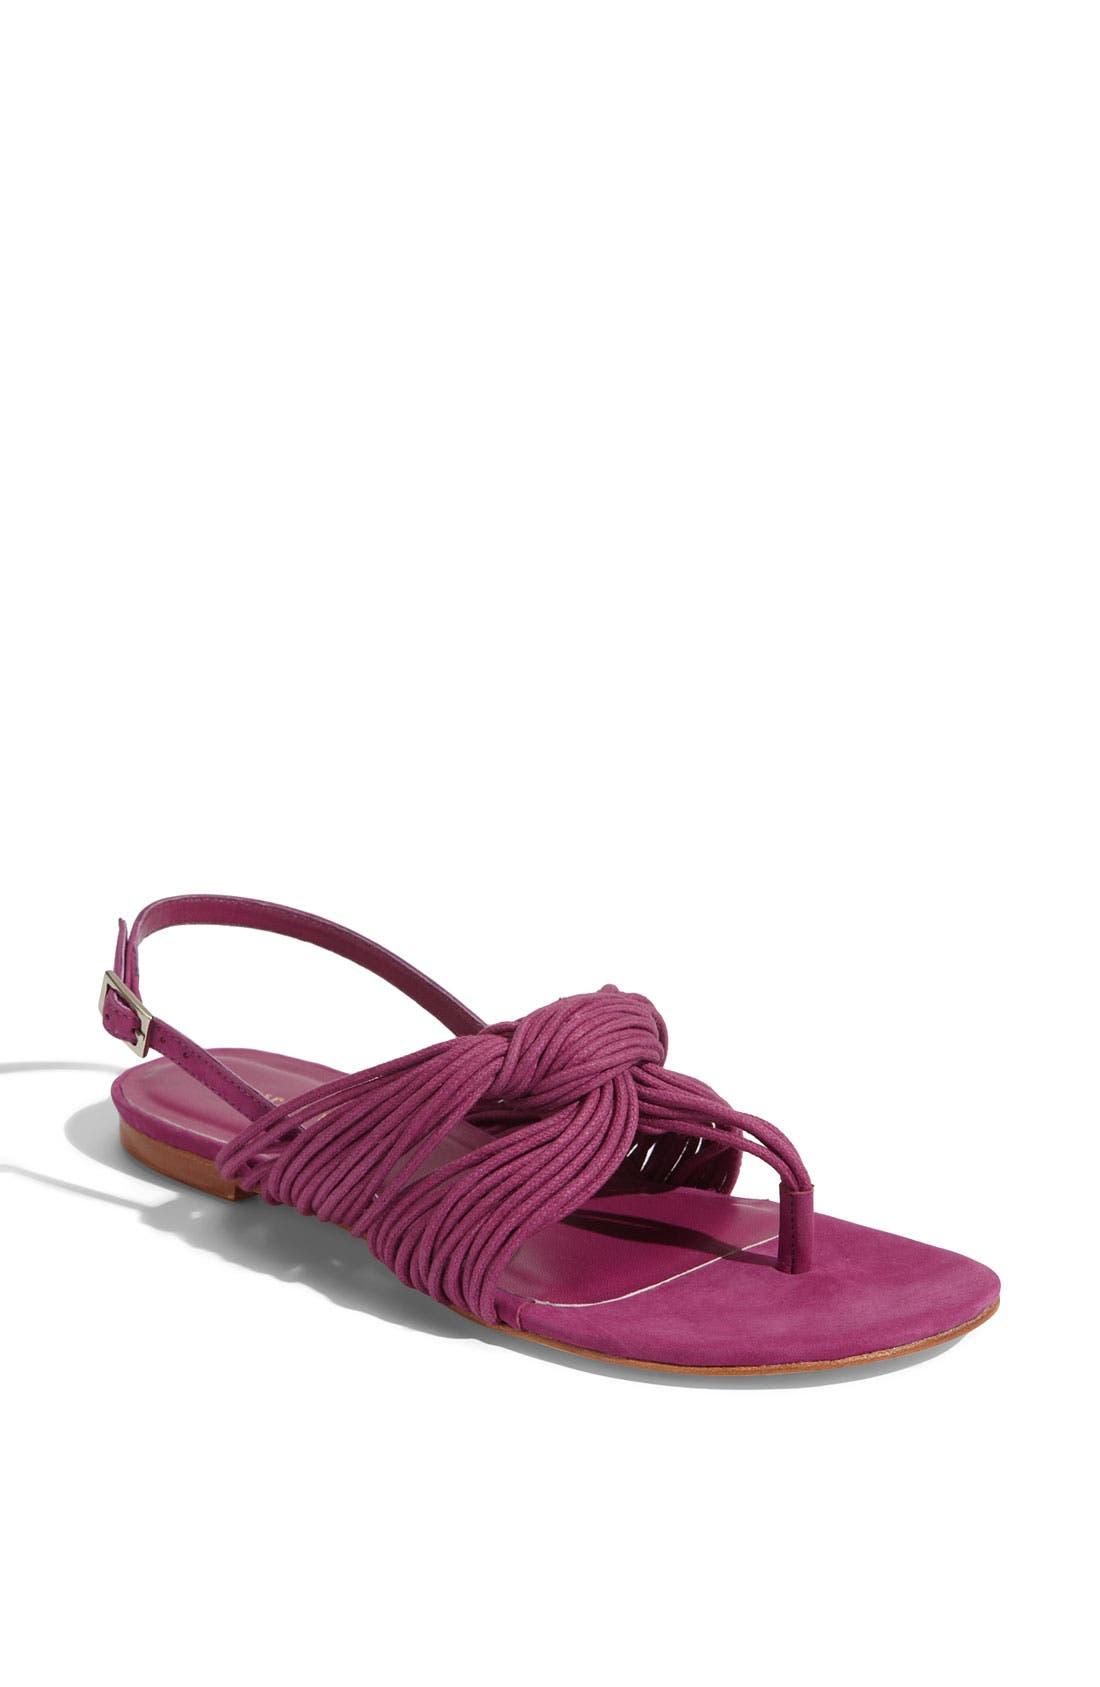 Main Image - Loeffler Randall 'Gioia' Sandal